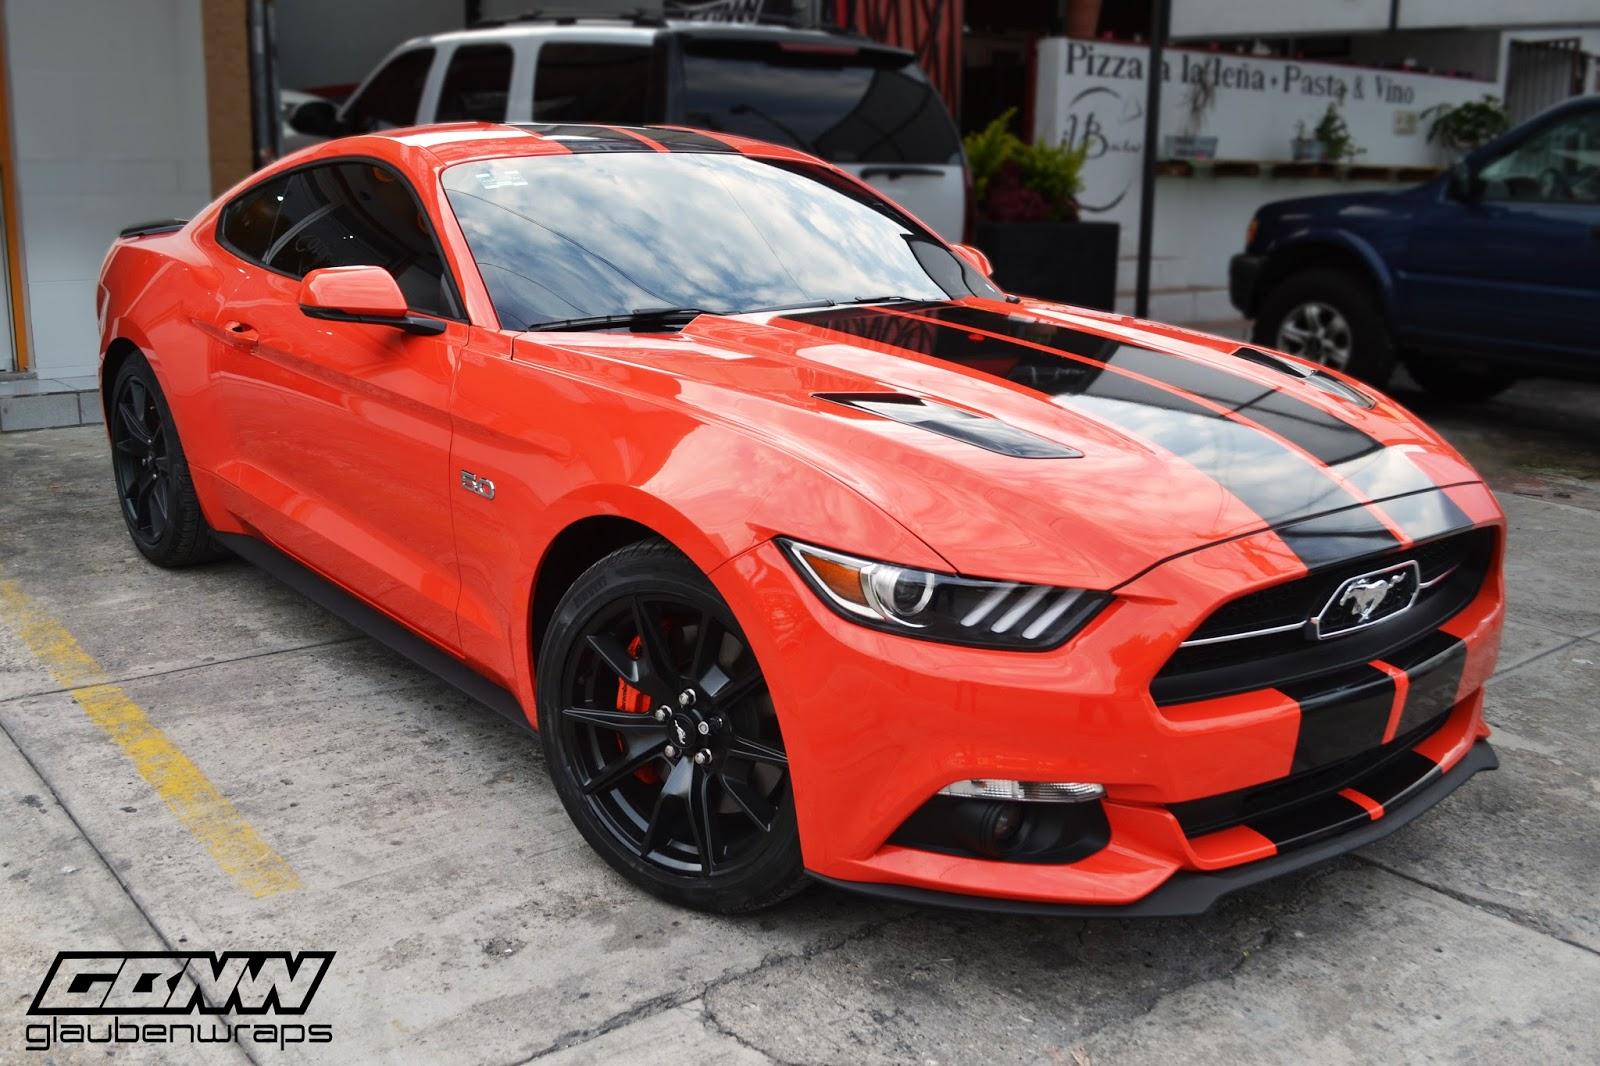 Glaubenwraps Ford Mustang 2016